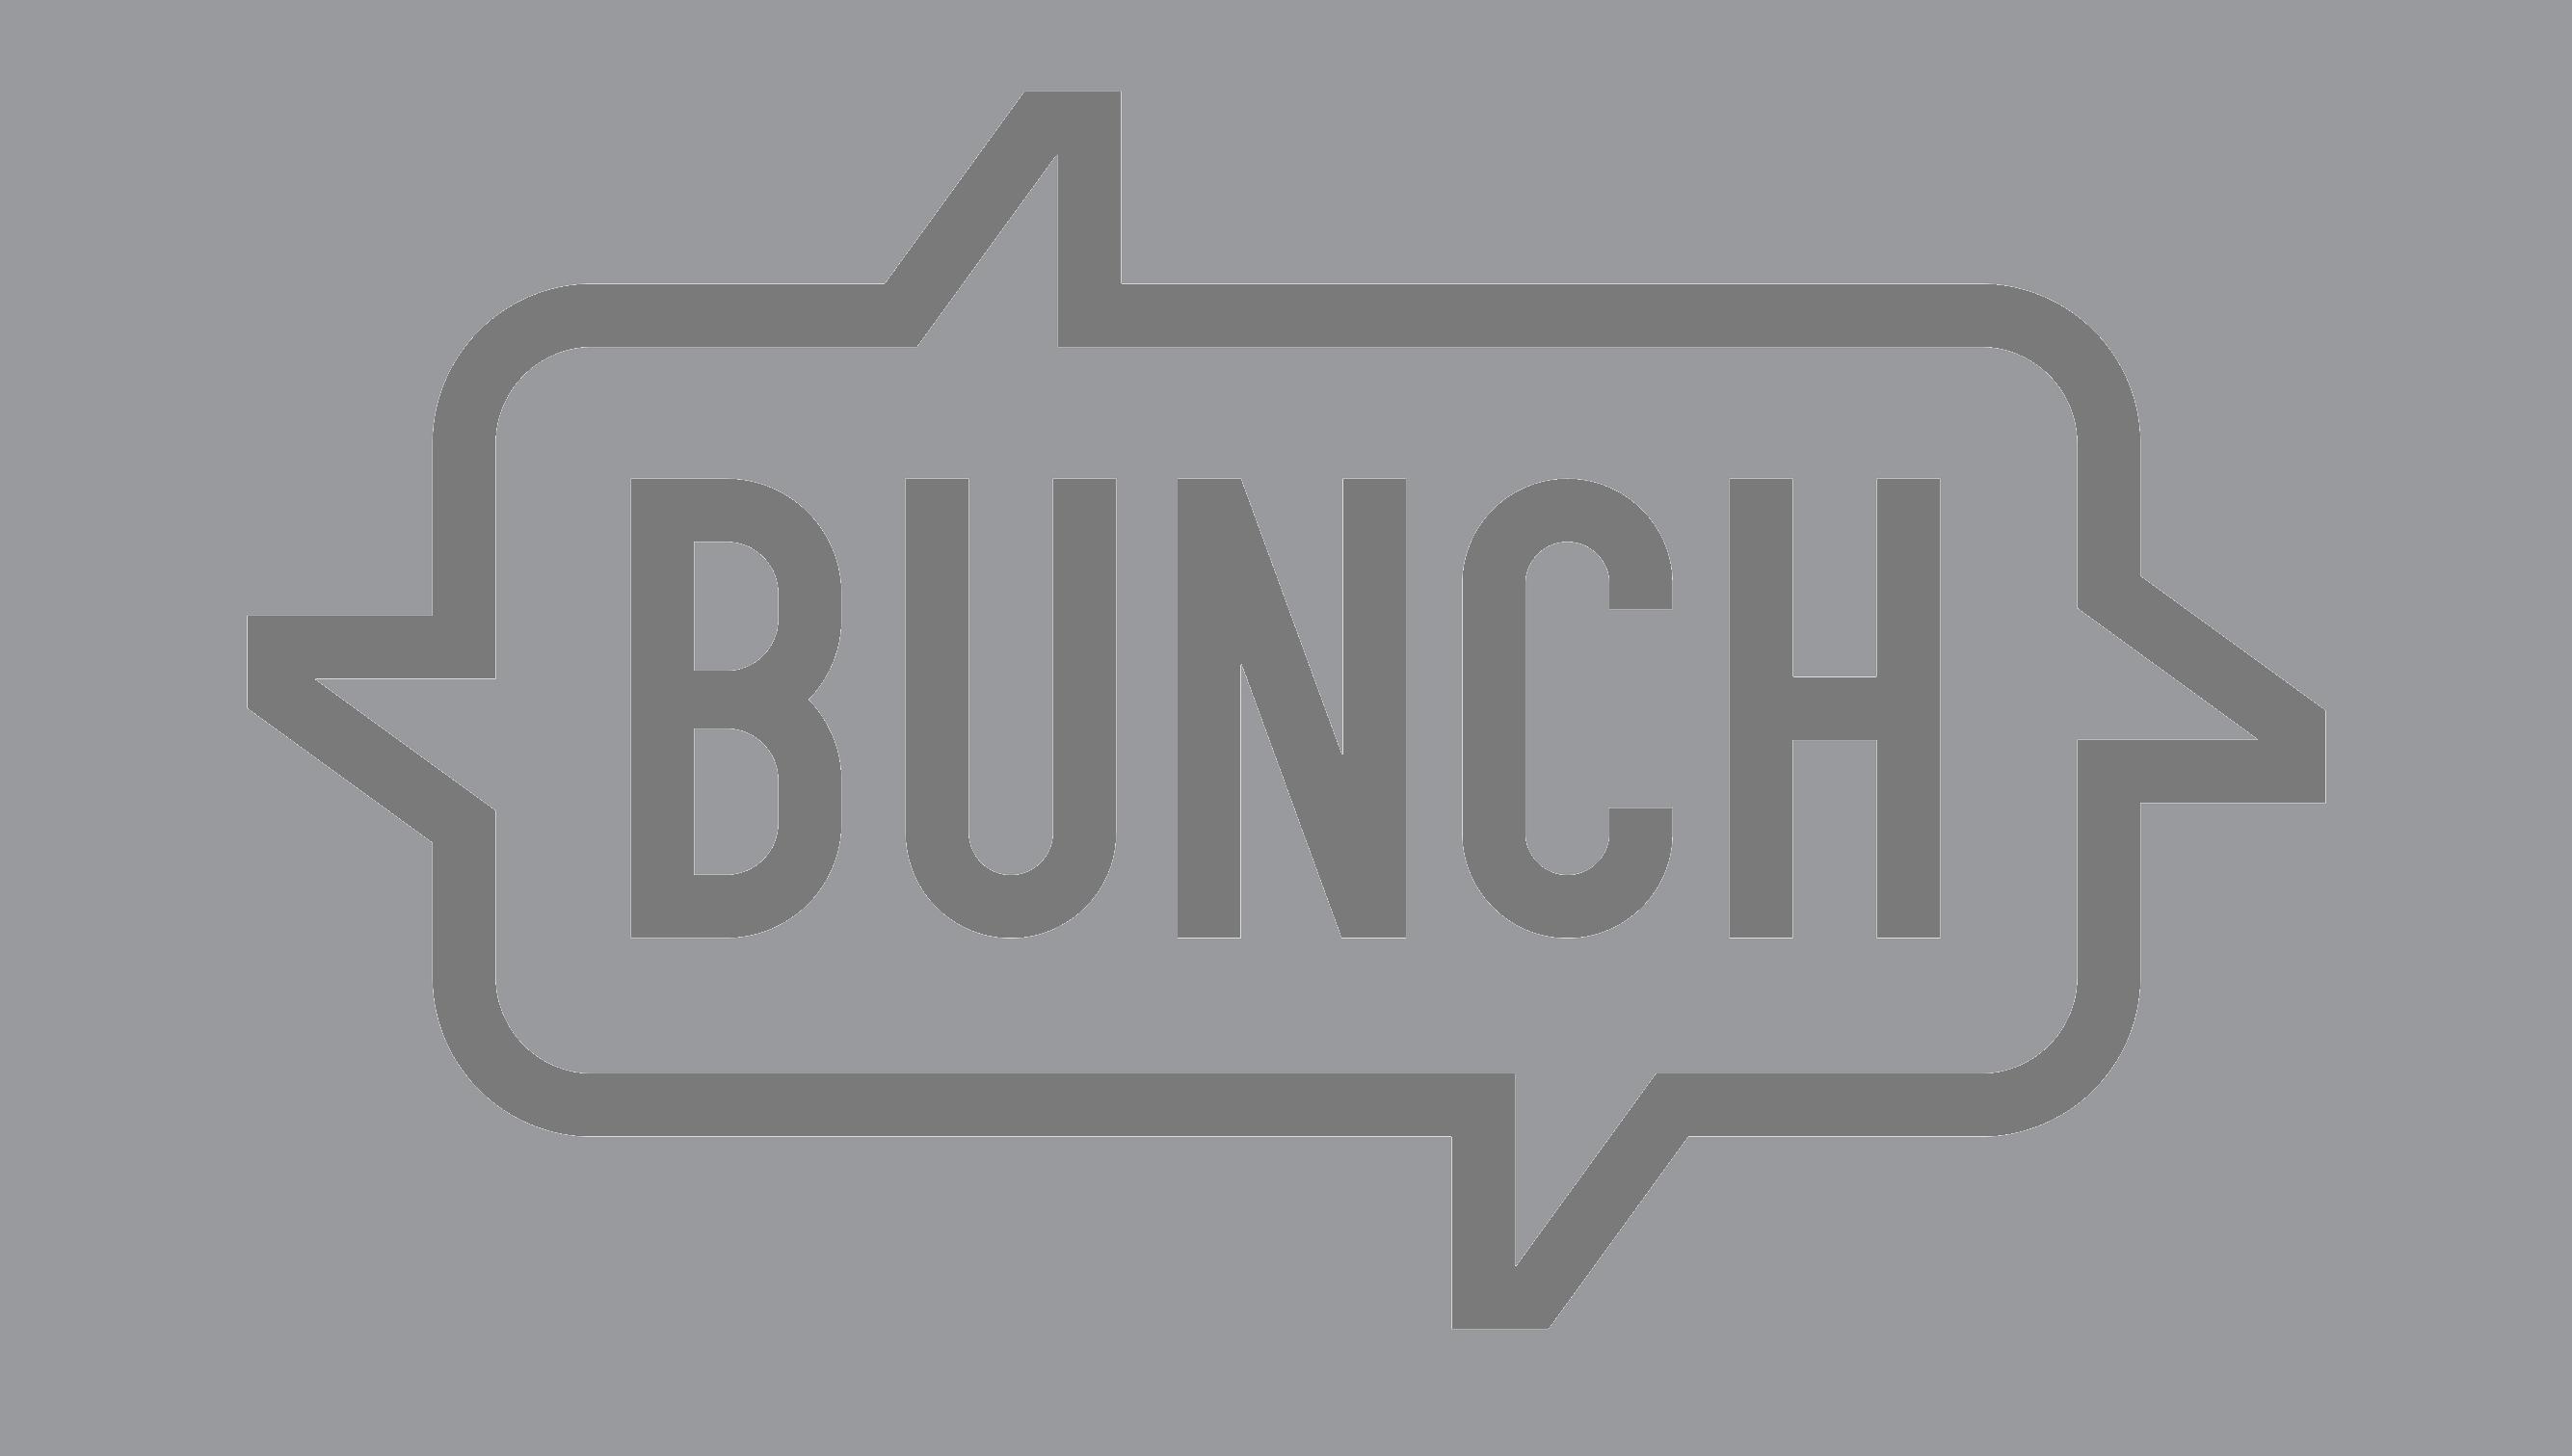 logo_grigio